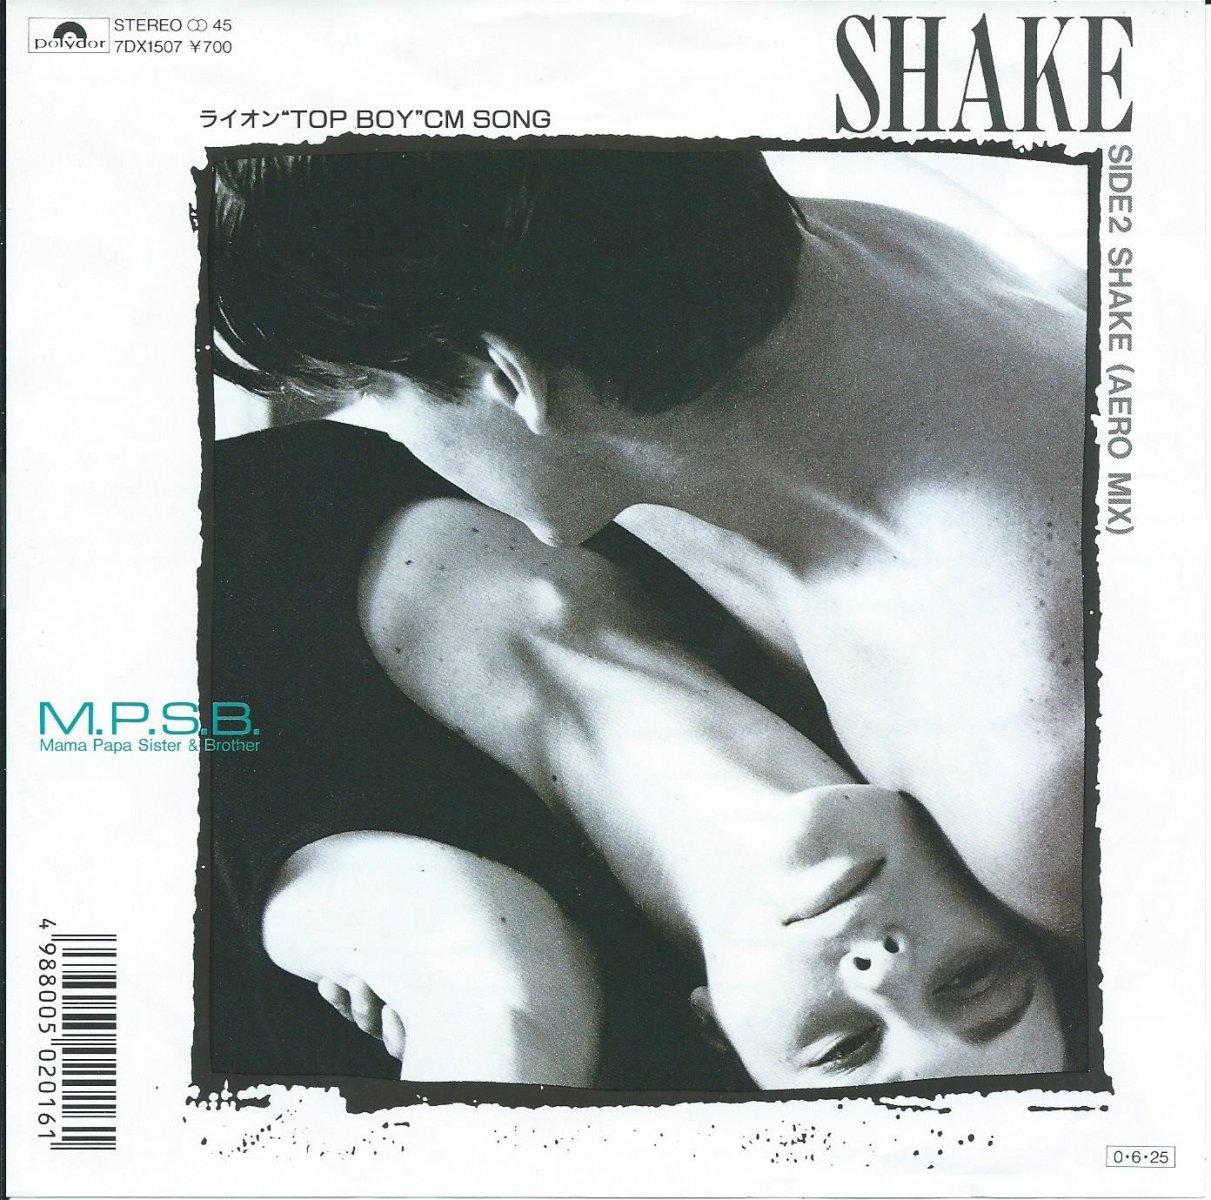 M.P.S.B. (MAMA PAPA SISTER & BROTHER) / SHAKE / SHAKE (AERO MIX) (7